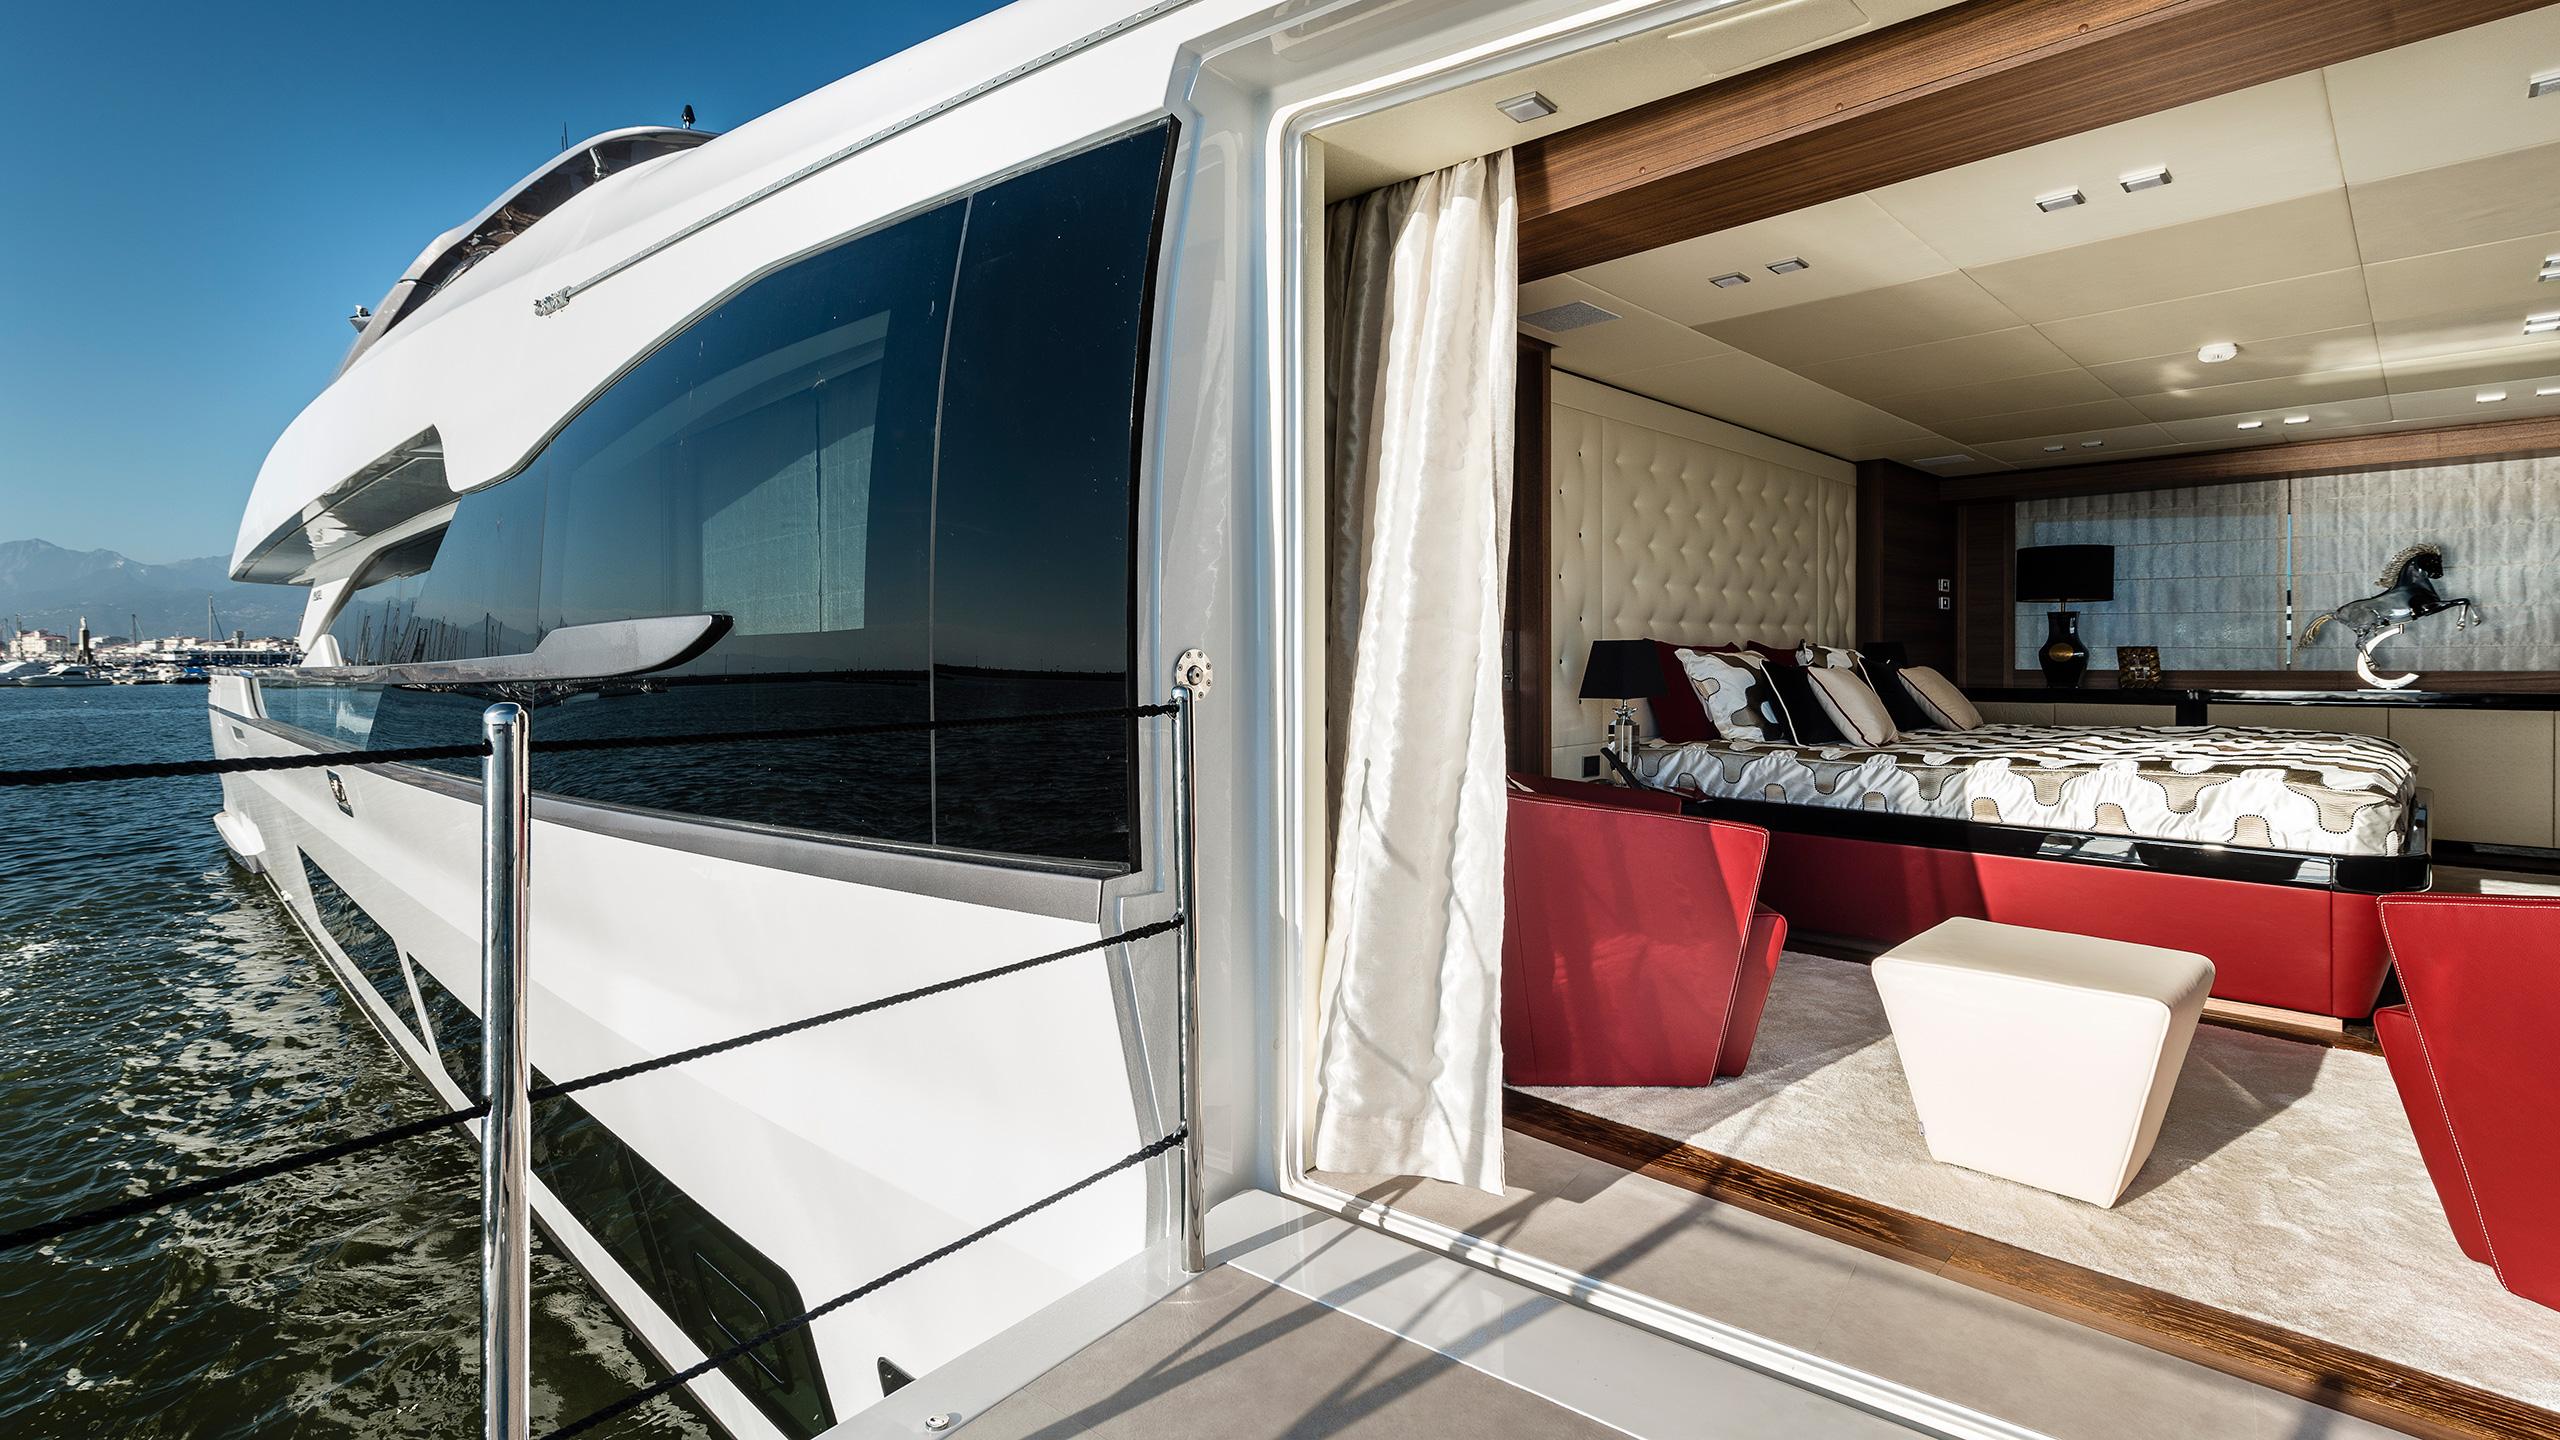 the-master-cabin-of-the-maiora-36-yacht-harmony